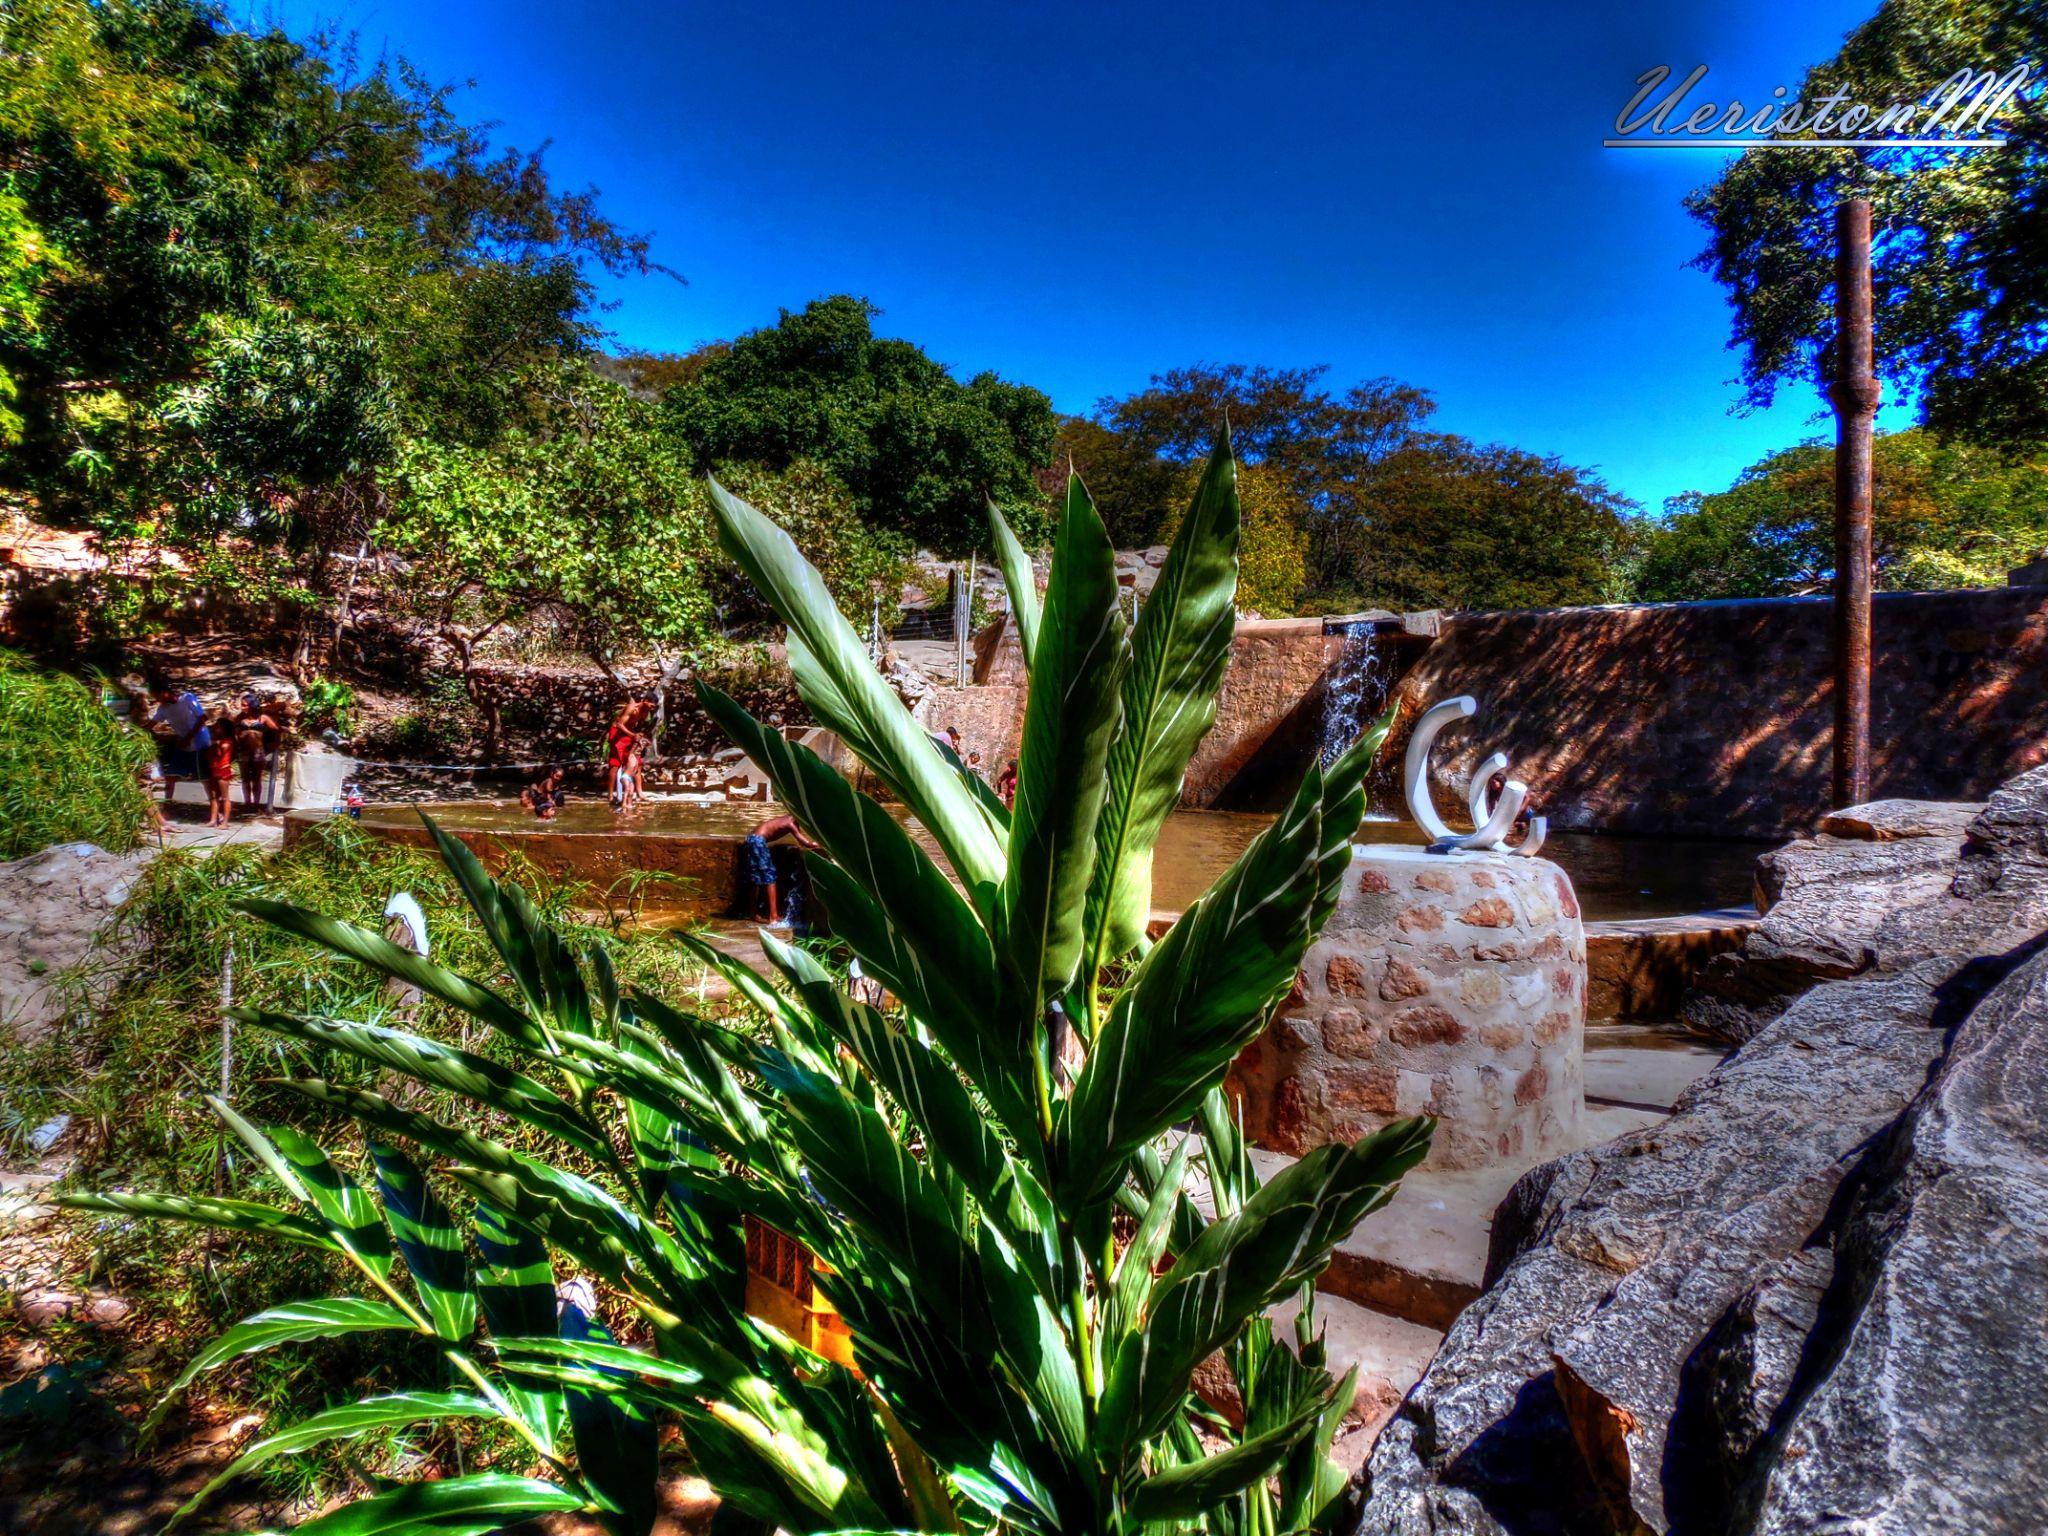 natureza  by Ueriston Machado